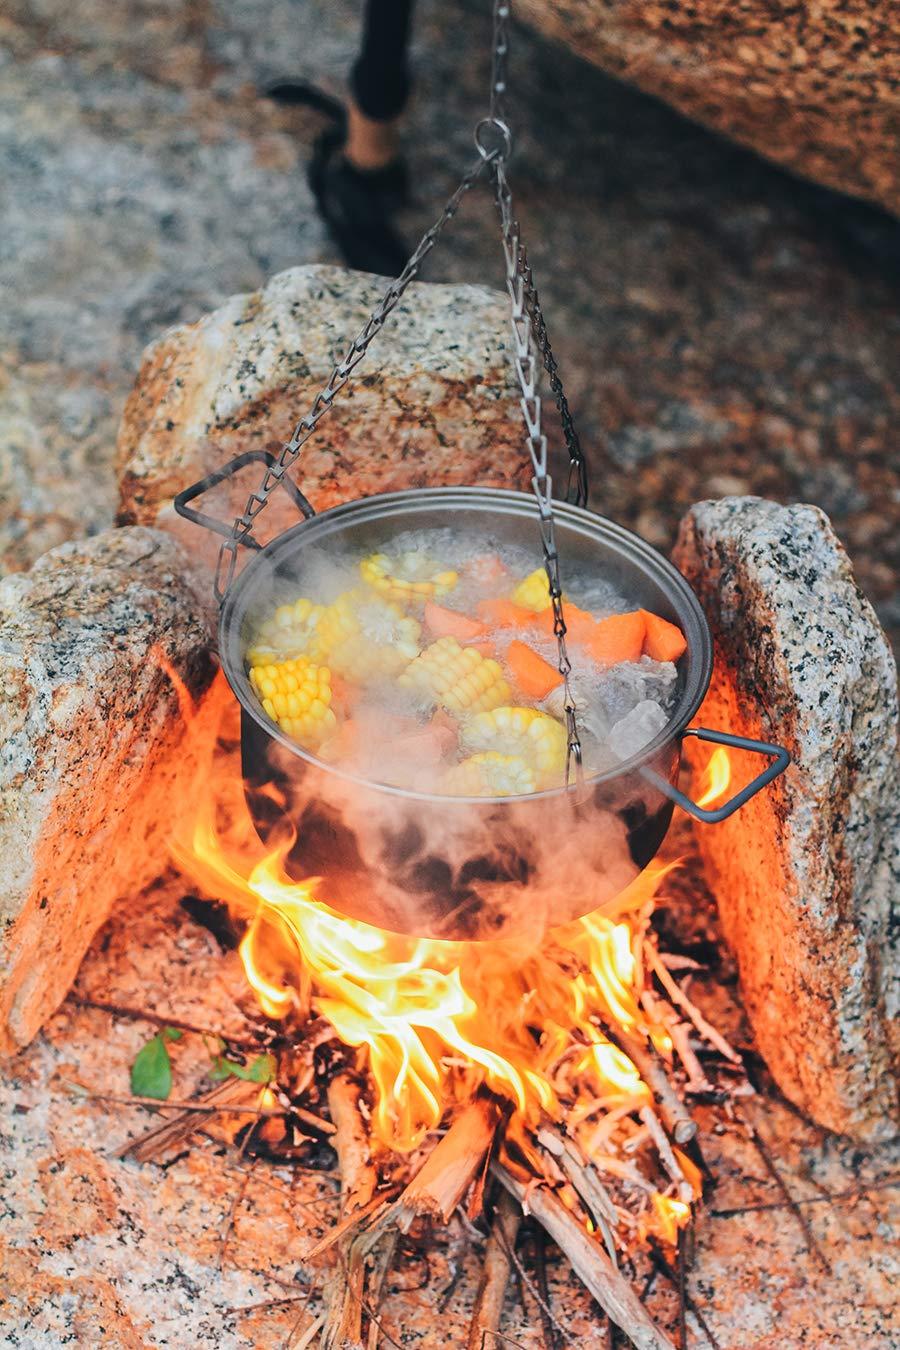 Keith Camping Wandern Picknick Kochgeschirr Topf Lagerfeuer Kochtopf Aufh/ängen Titan Topf 2.5L 350/g